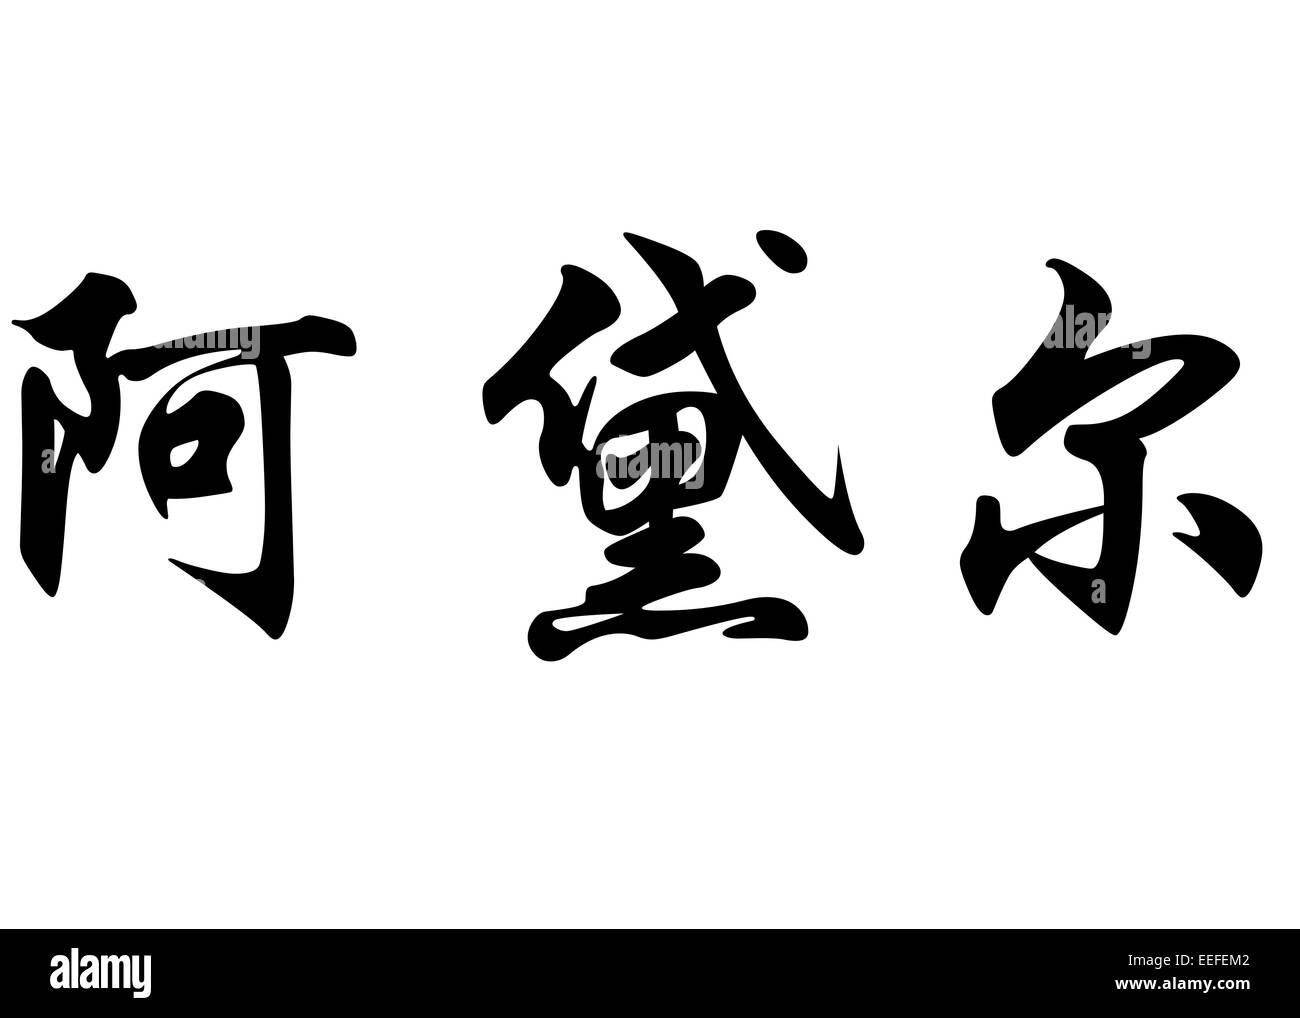 English name adele in chinese kanji calligraphy characters or stock english name adele in chinese kanji calligraphy characters or japanese characters biocorpaavc Choice Image